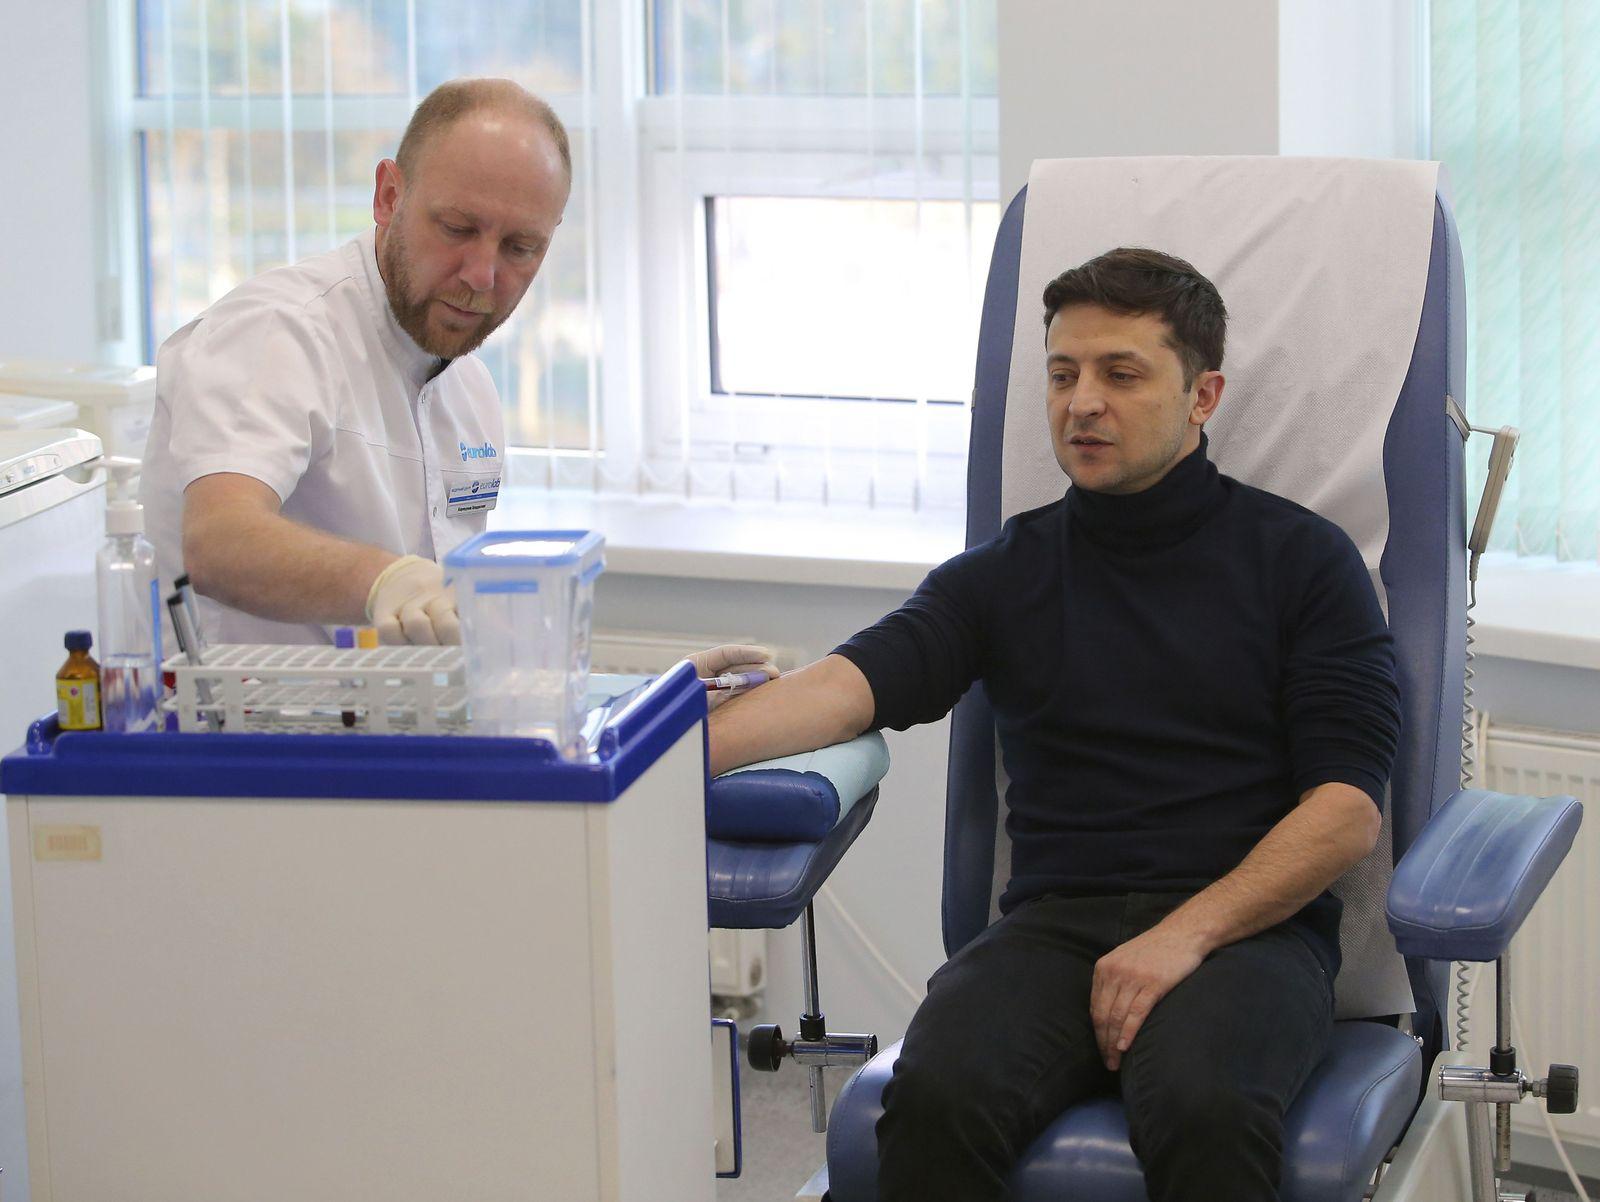 Blutabnahme/ Volodymyr Zelensky